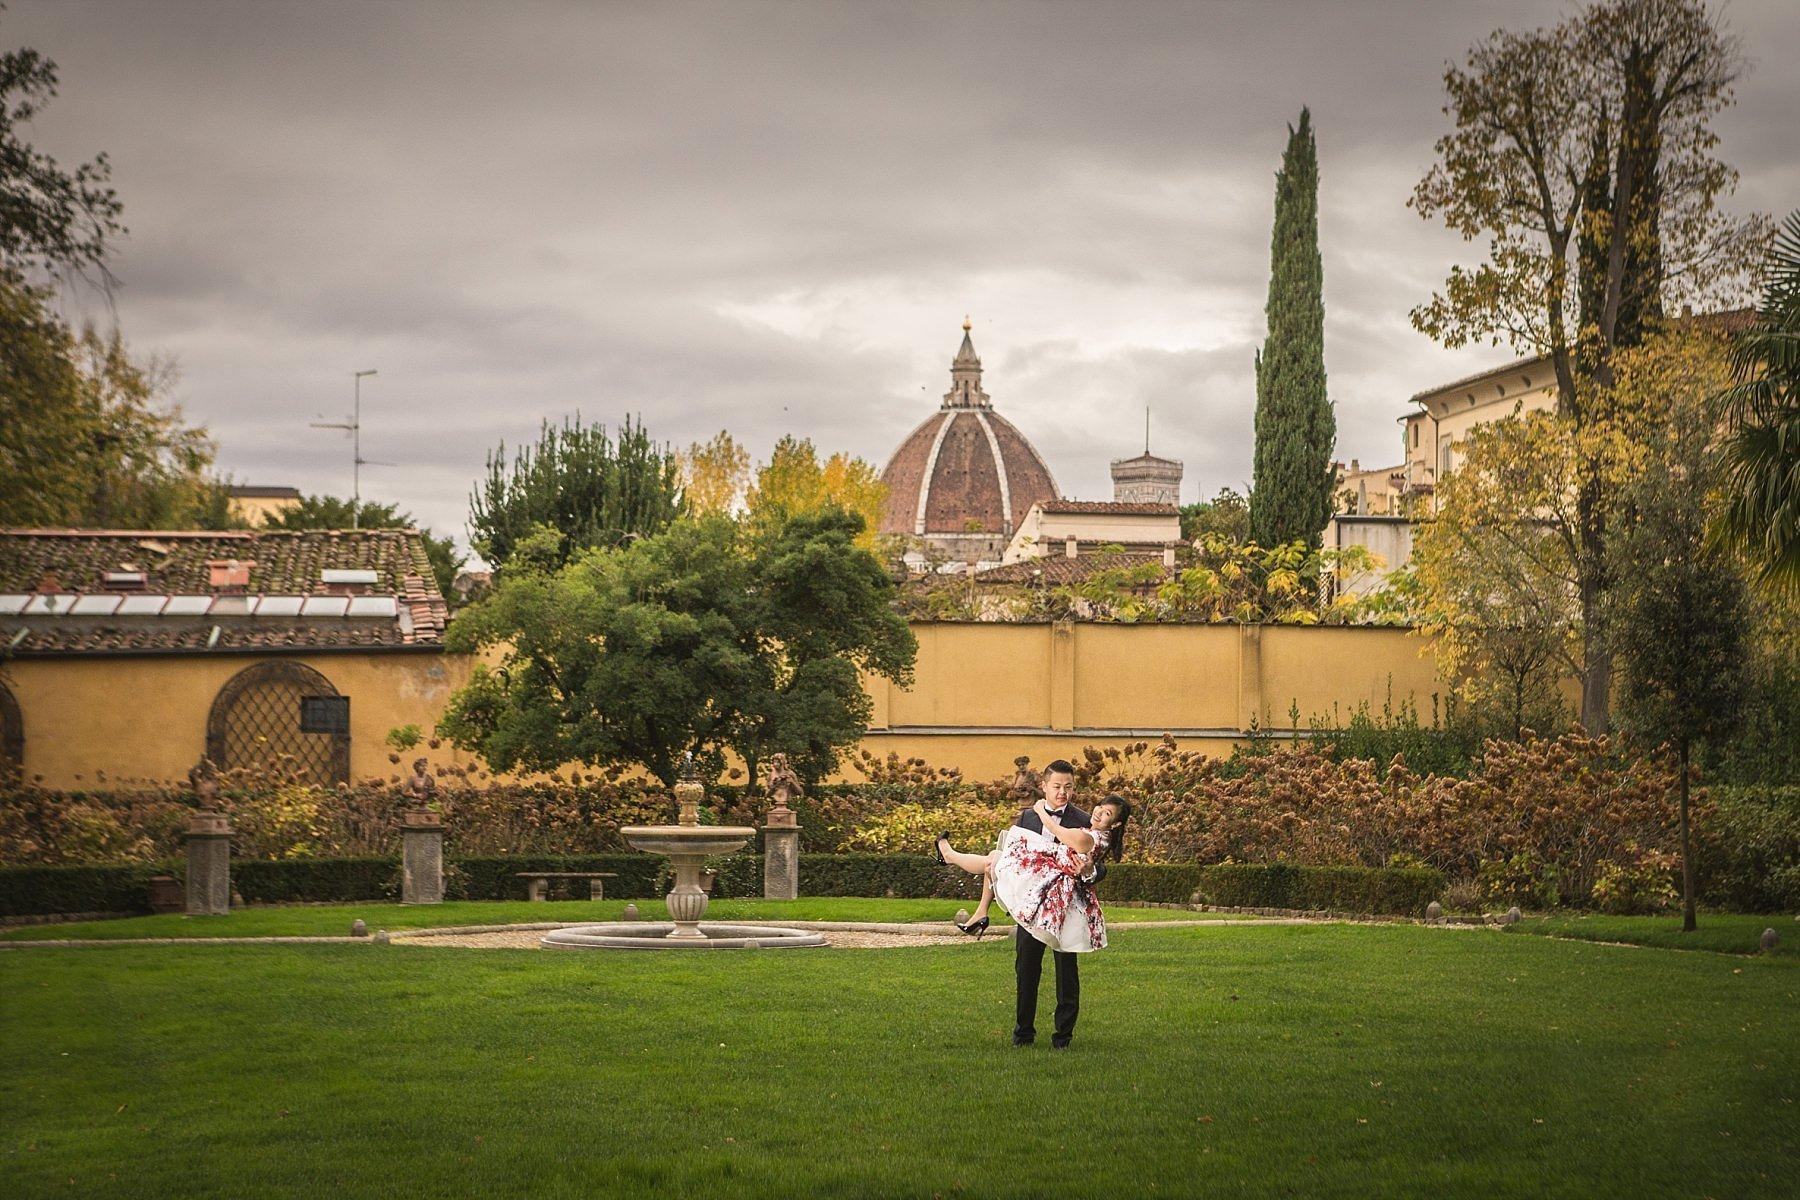 fotografo di matrimoni a firenze four seasons 16 1